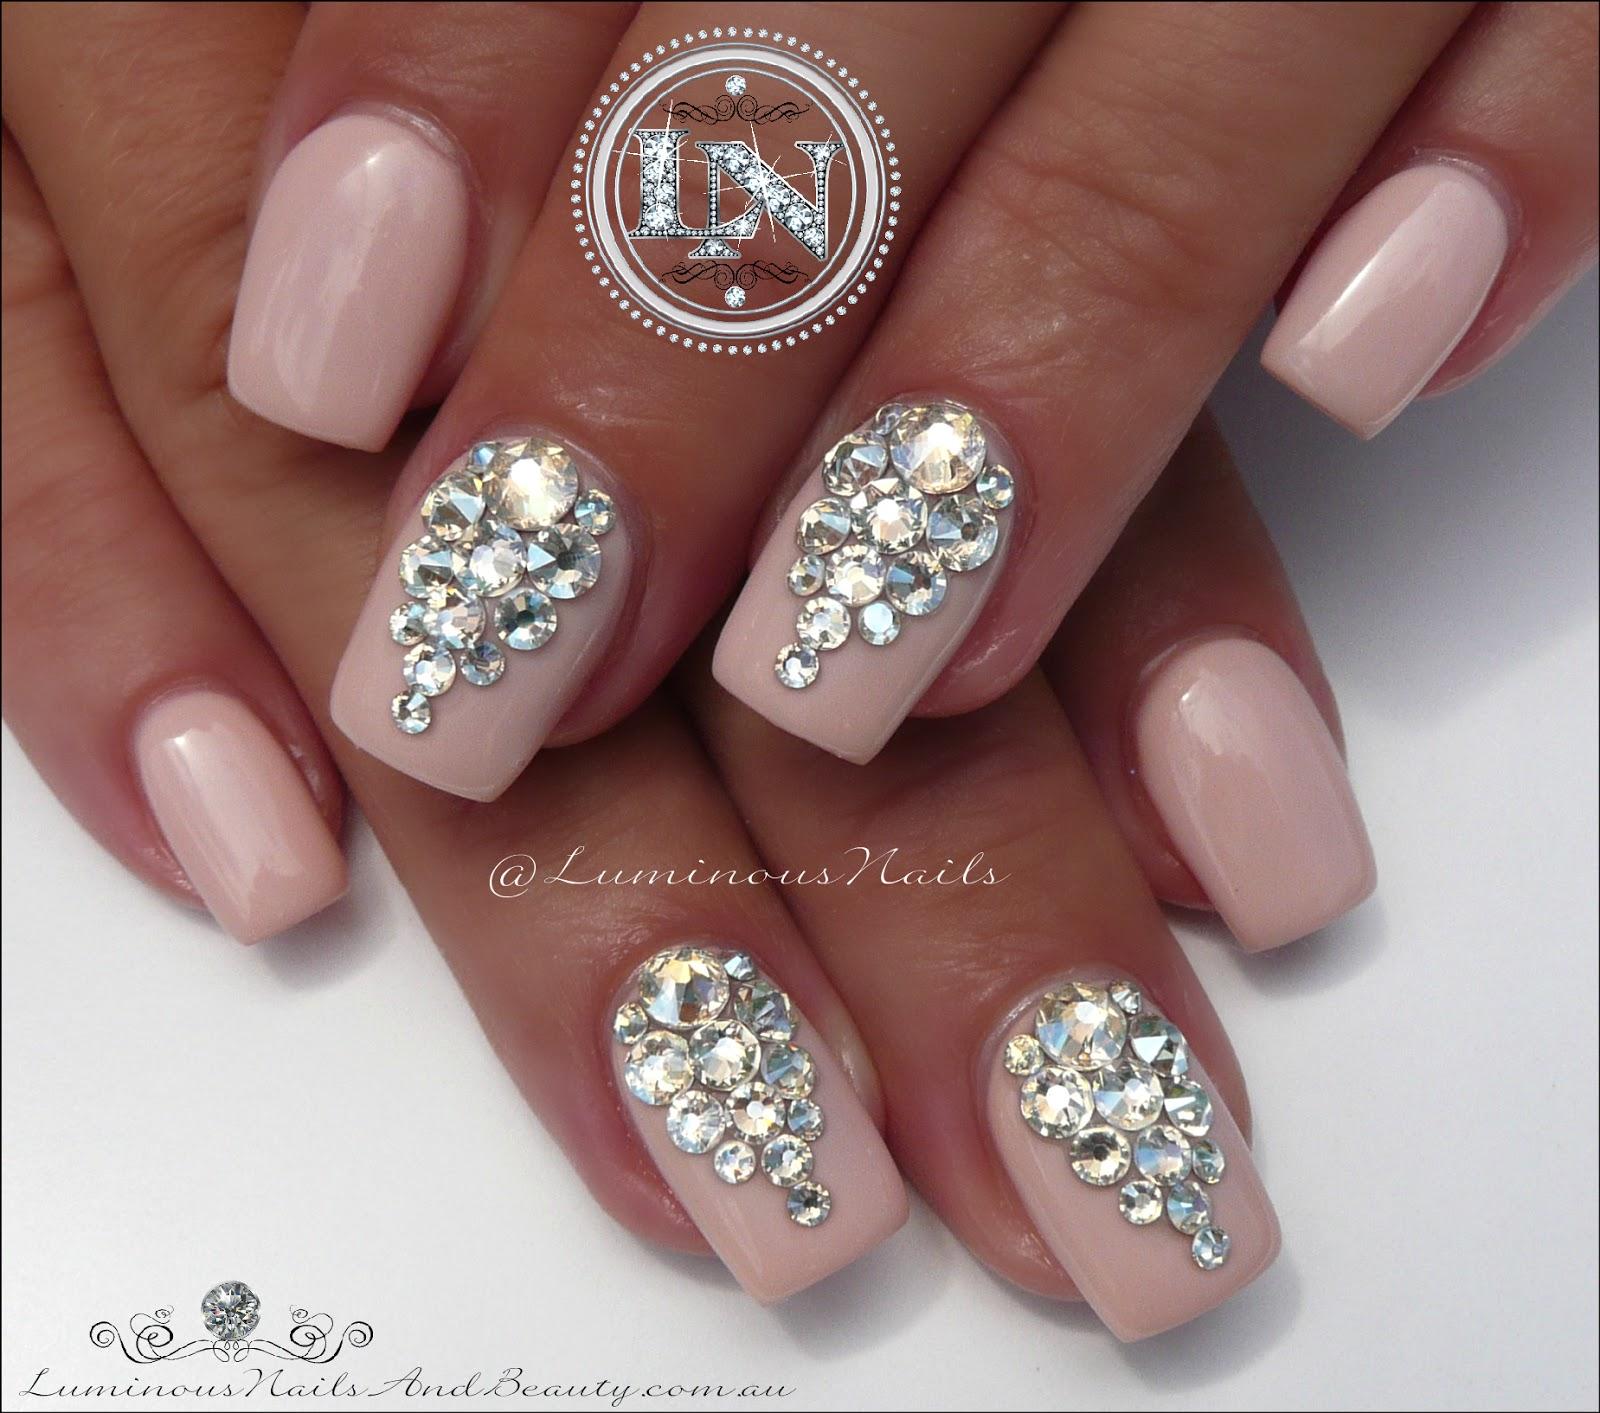 Swarovski nails!